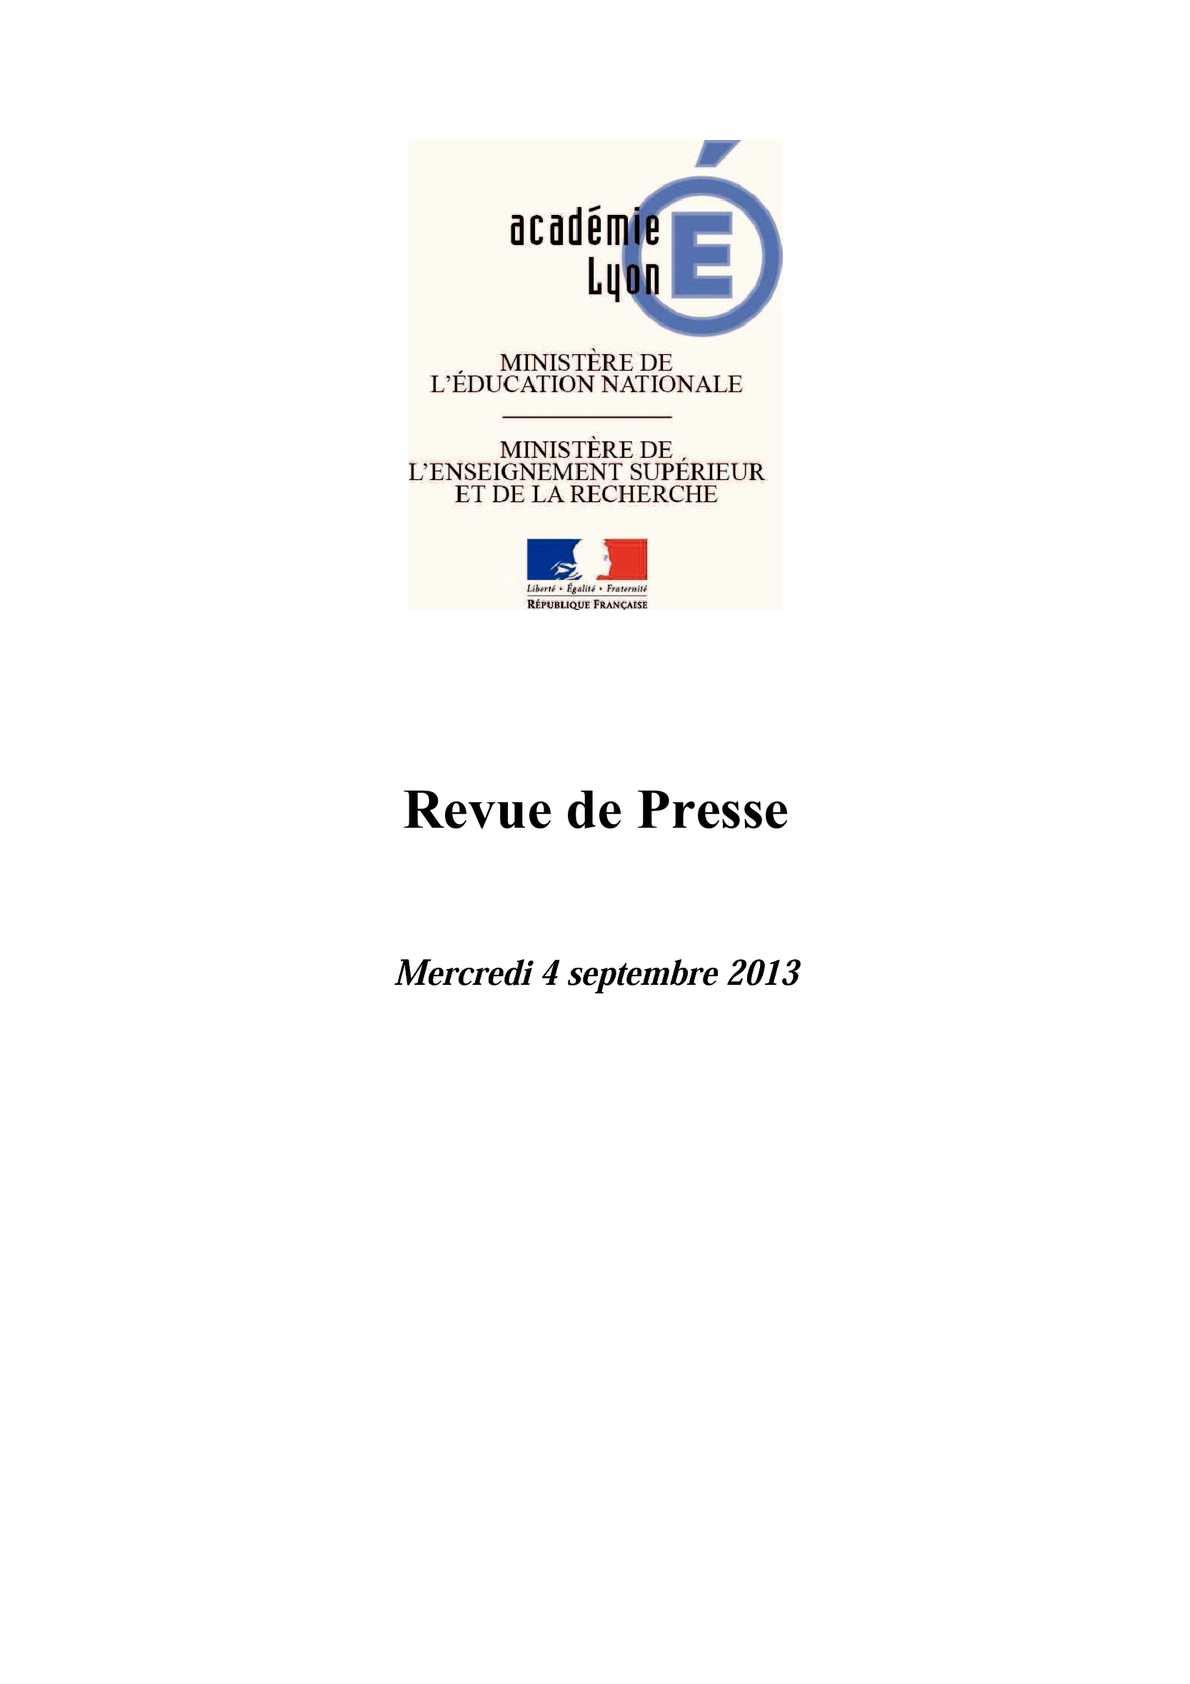 043d281fbab0e7 Calaméo - Revue de presse du mercredi 4 septembre 2013